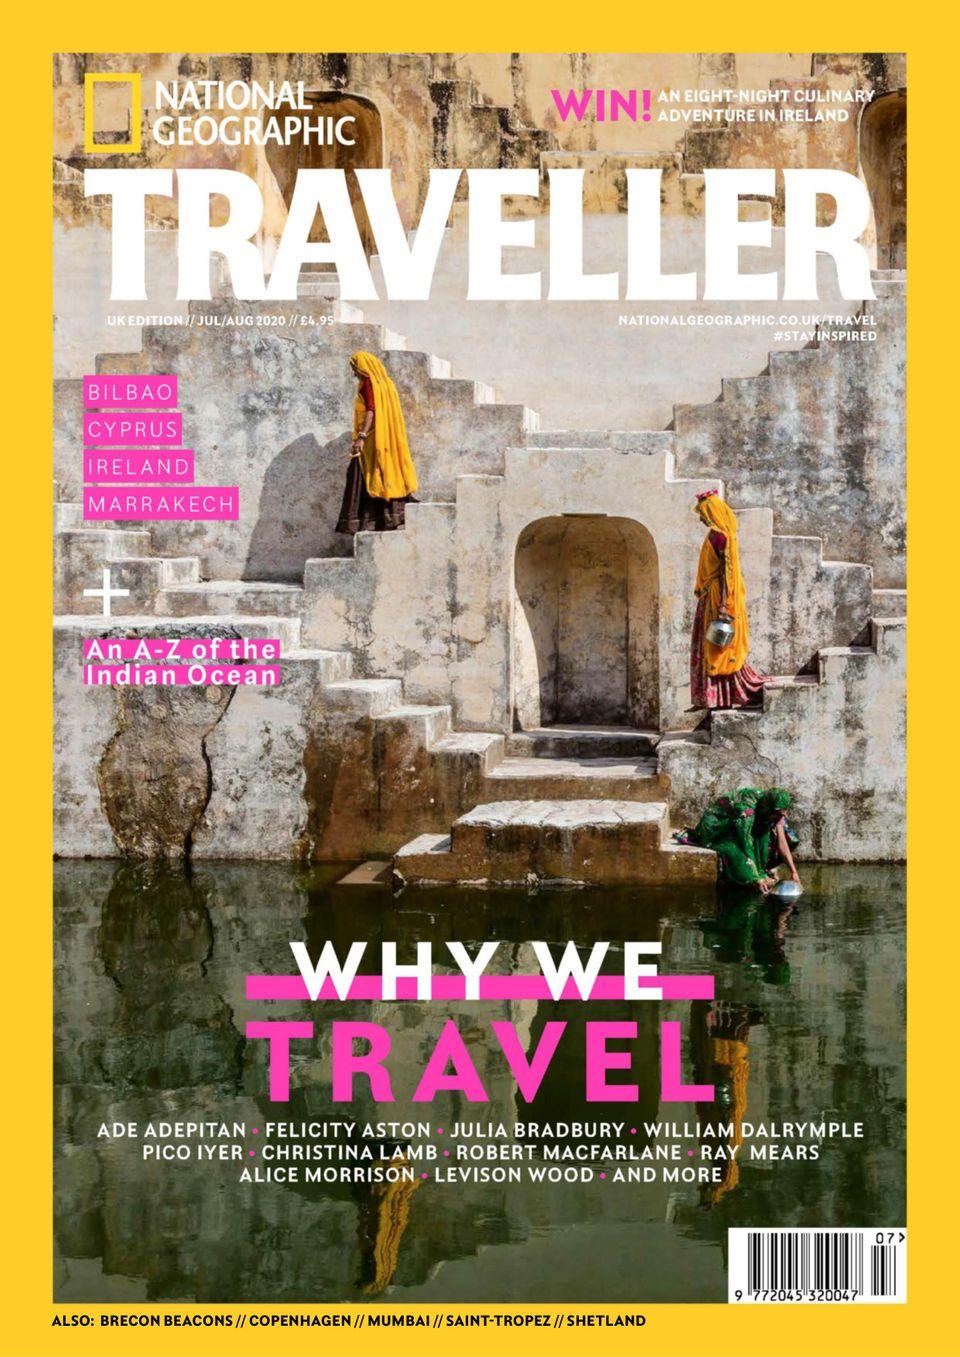 National Geographic Suoratoisto